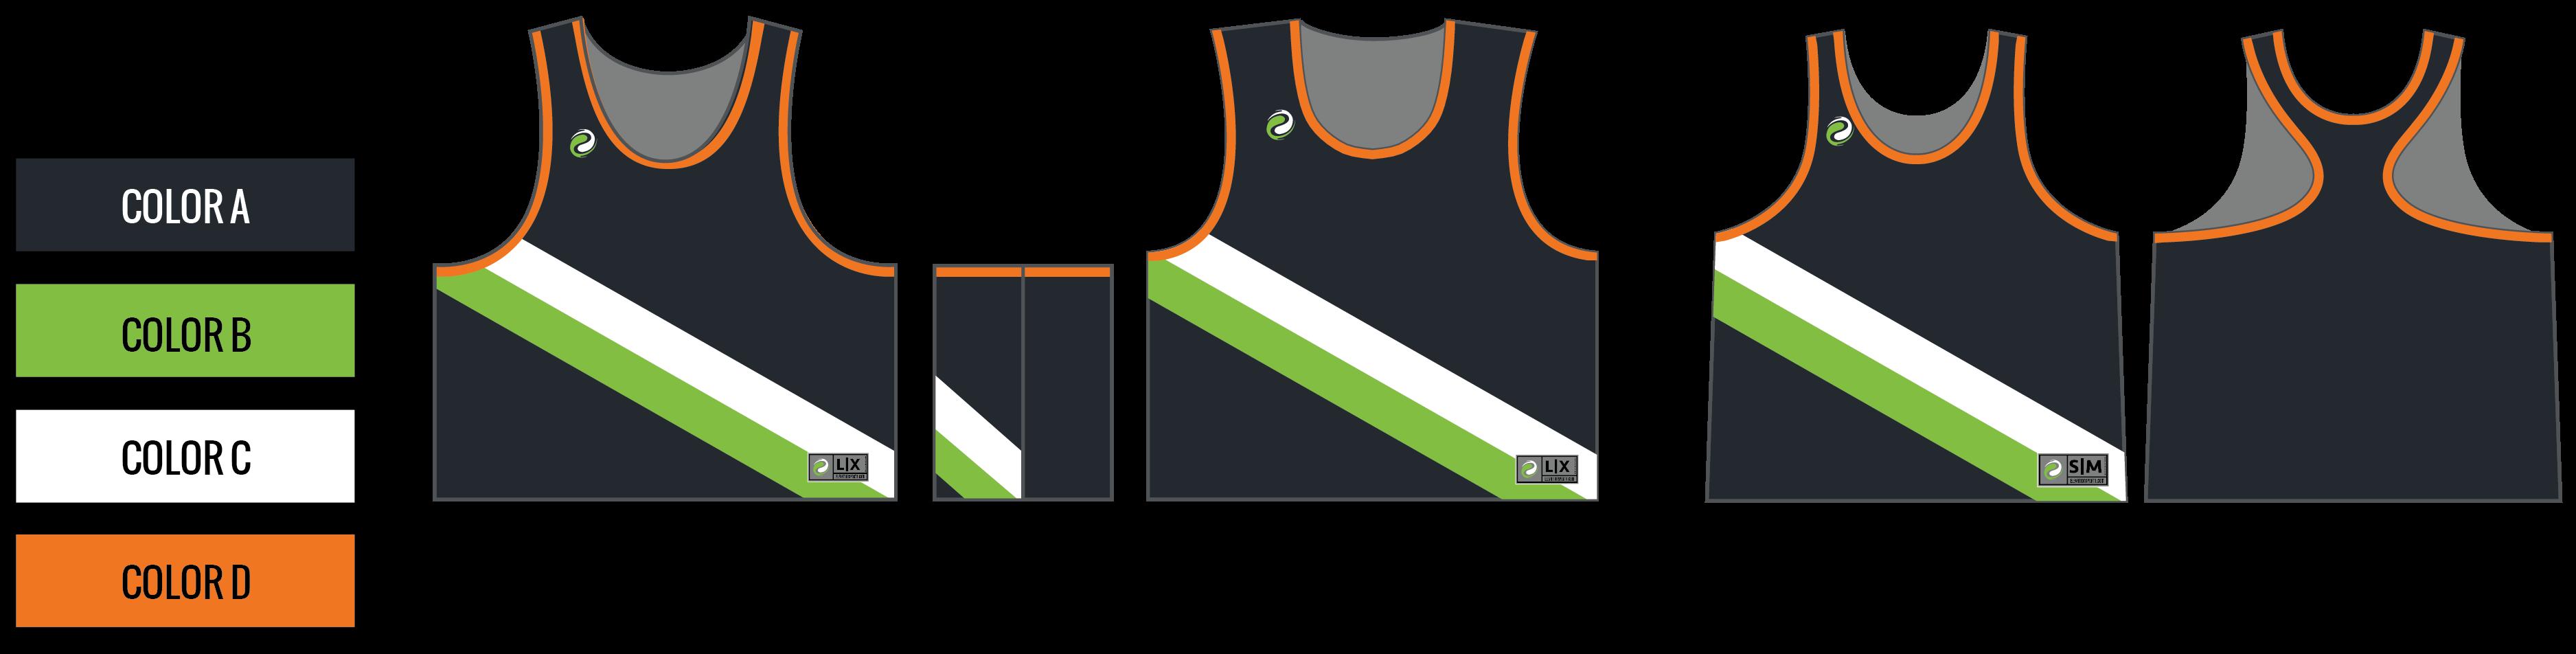 Custom Sublimated Lacrosse Pinnies - Design LXR21